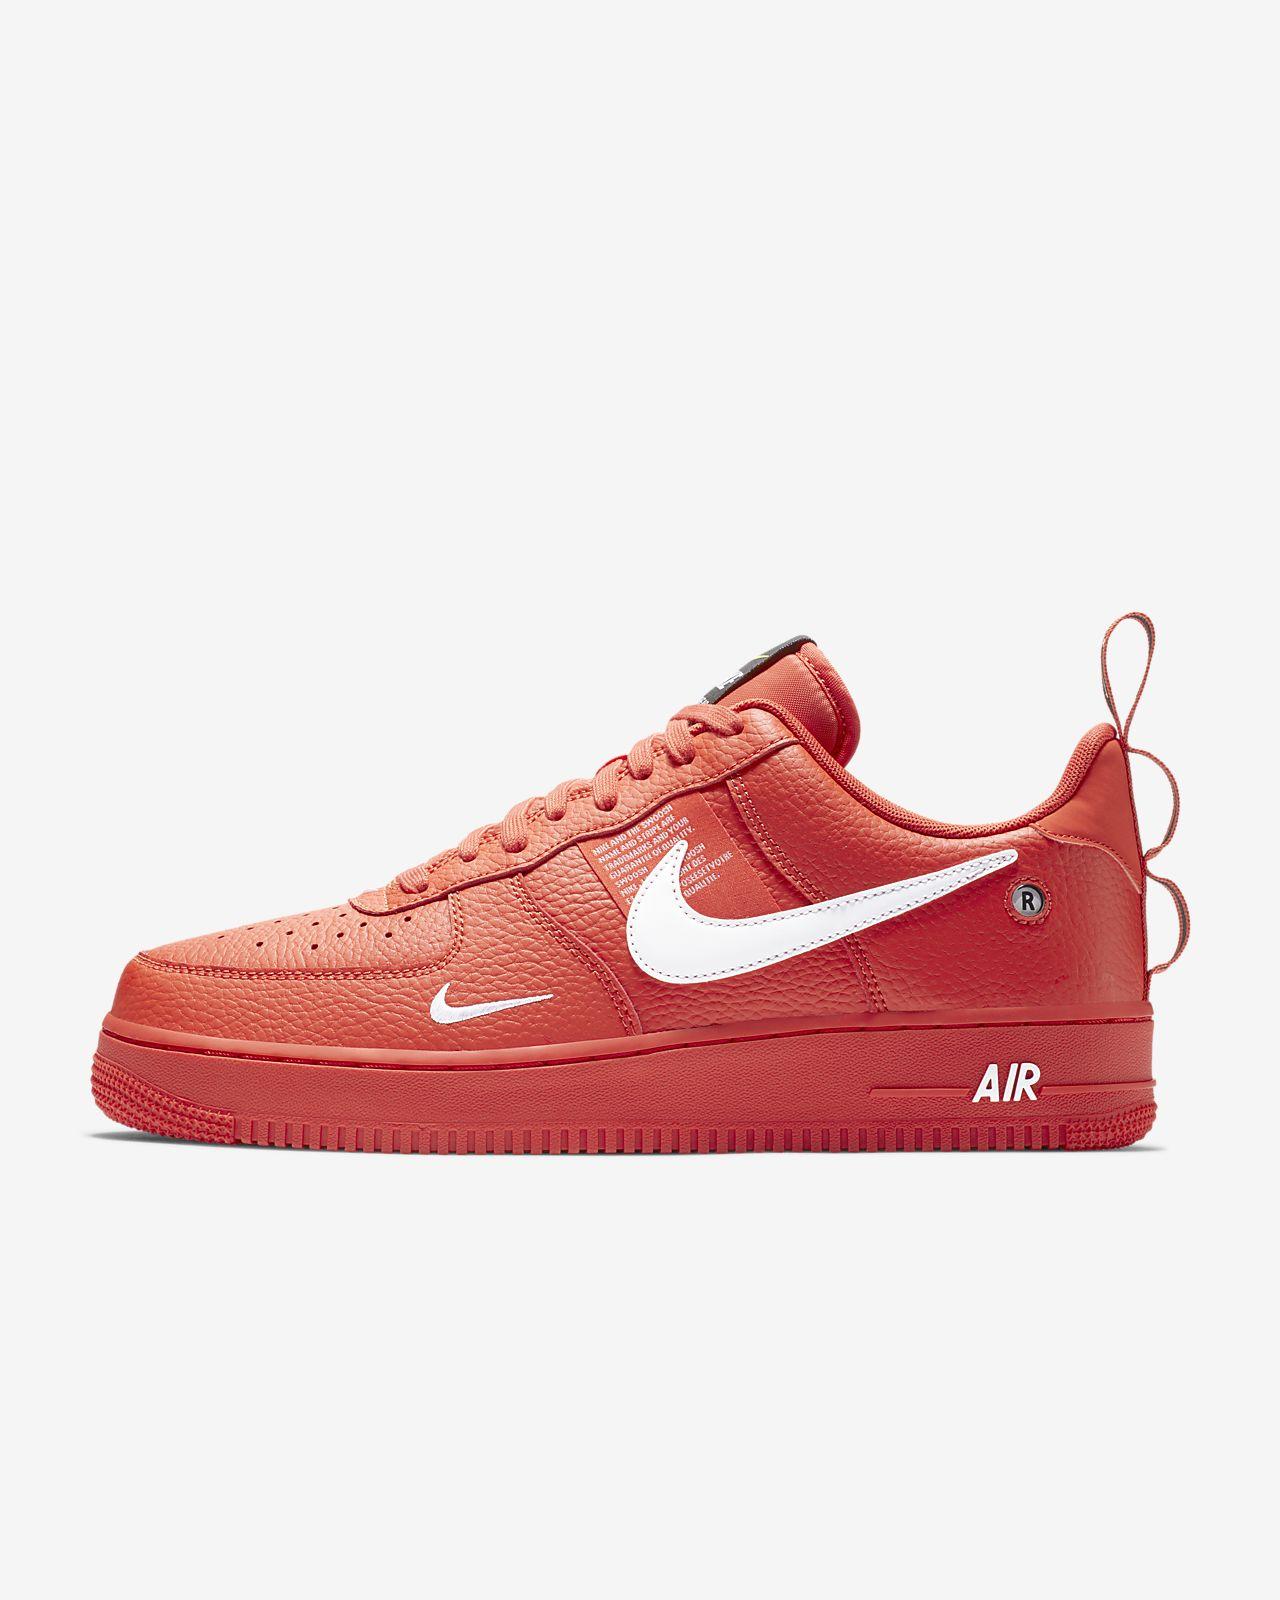 new style 471c0 8339b ... Calzado para hombre Nike Air Force 1  07 LV8 Utility